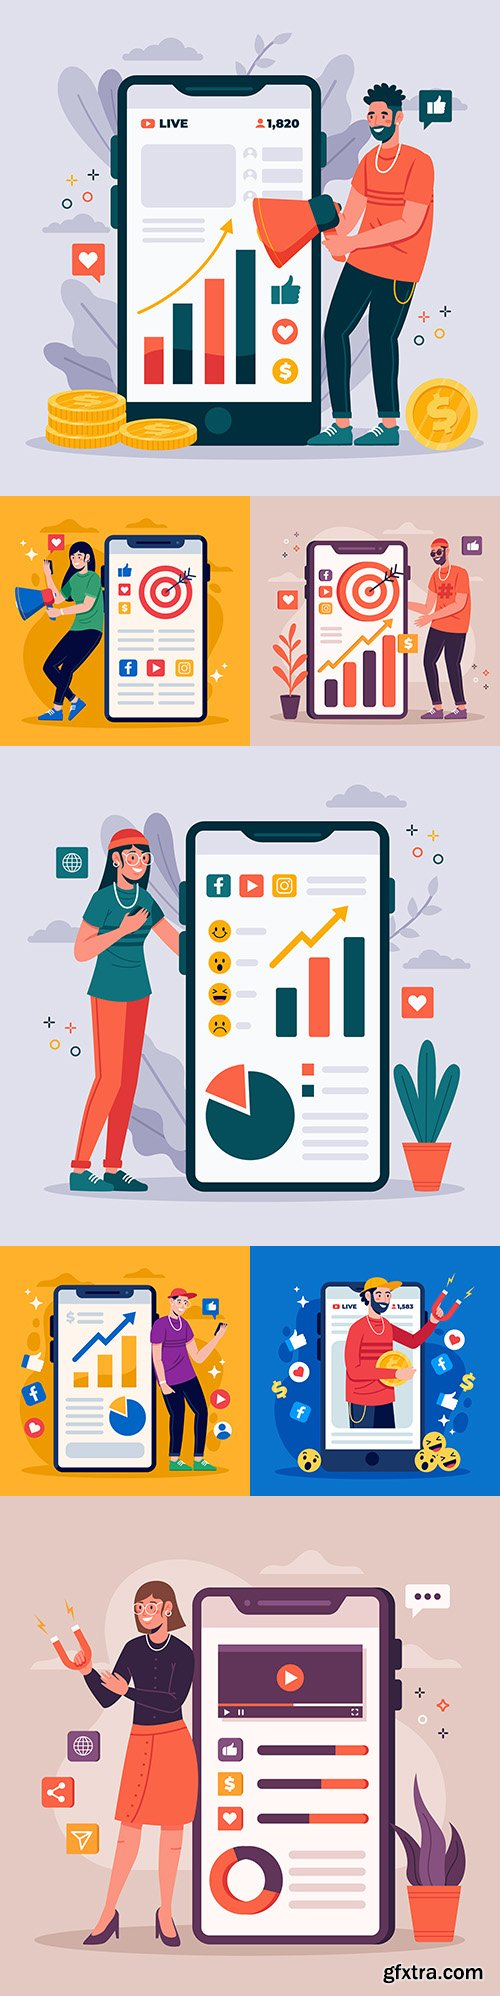 Phone marketing on social media flat design